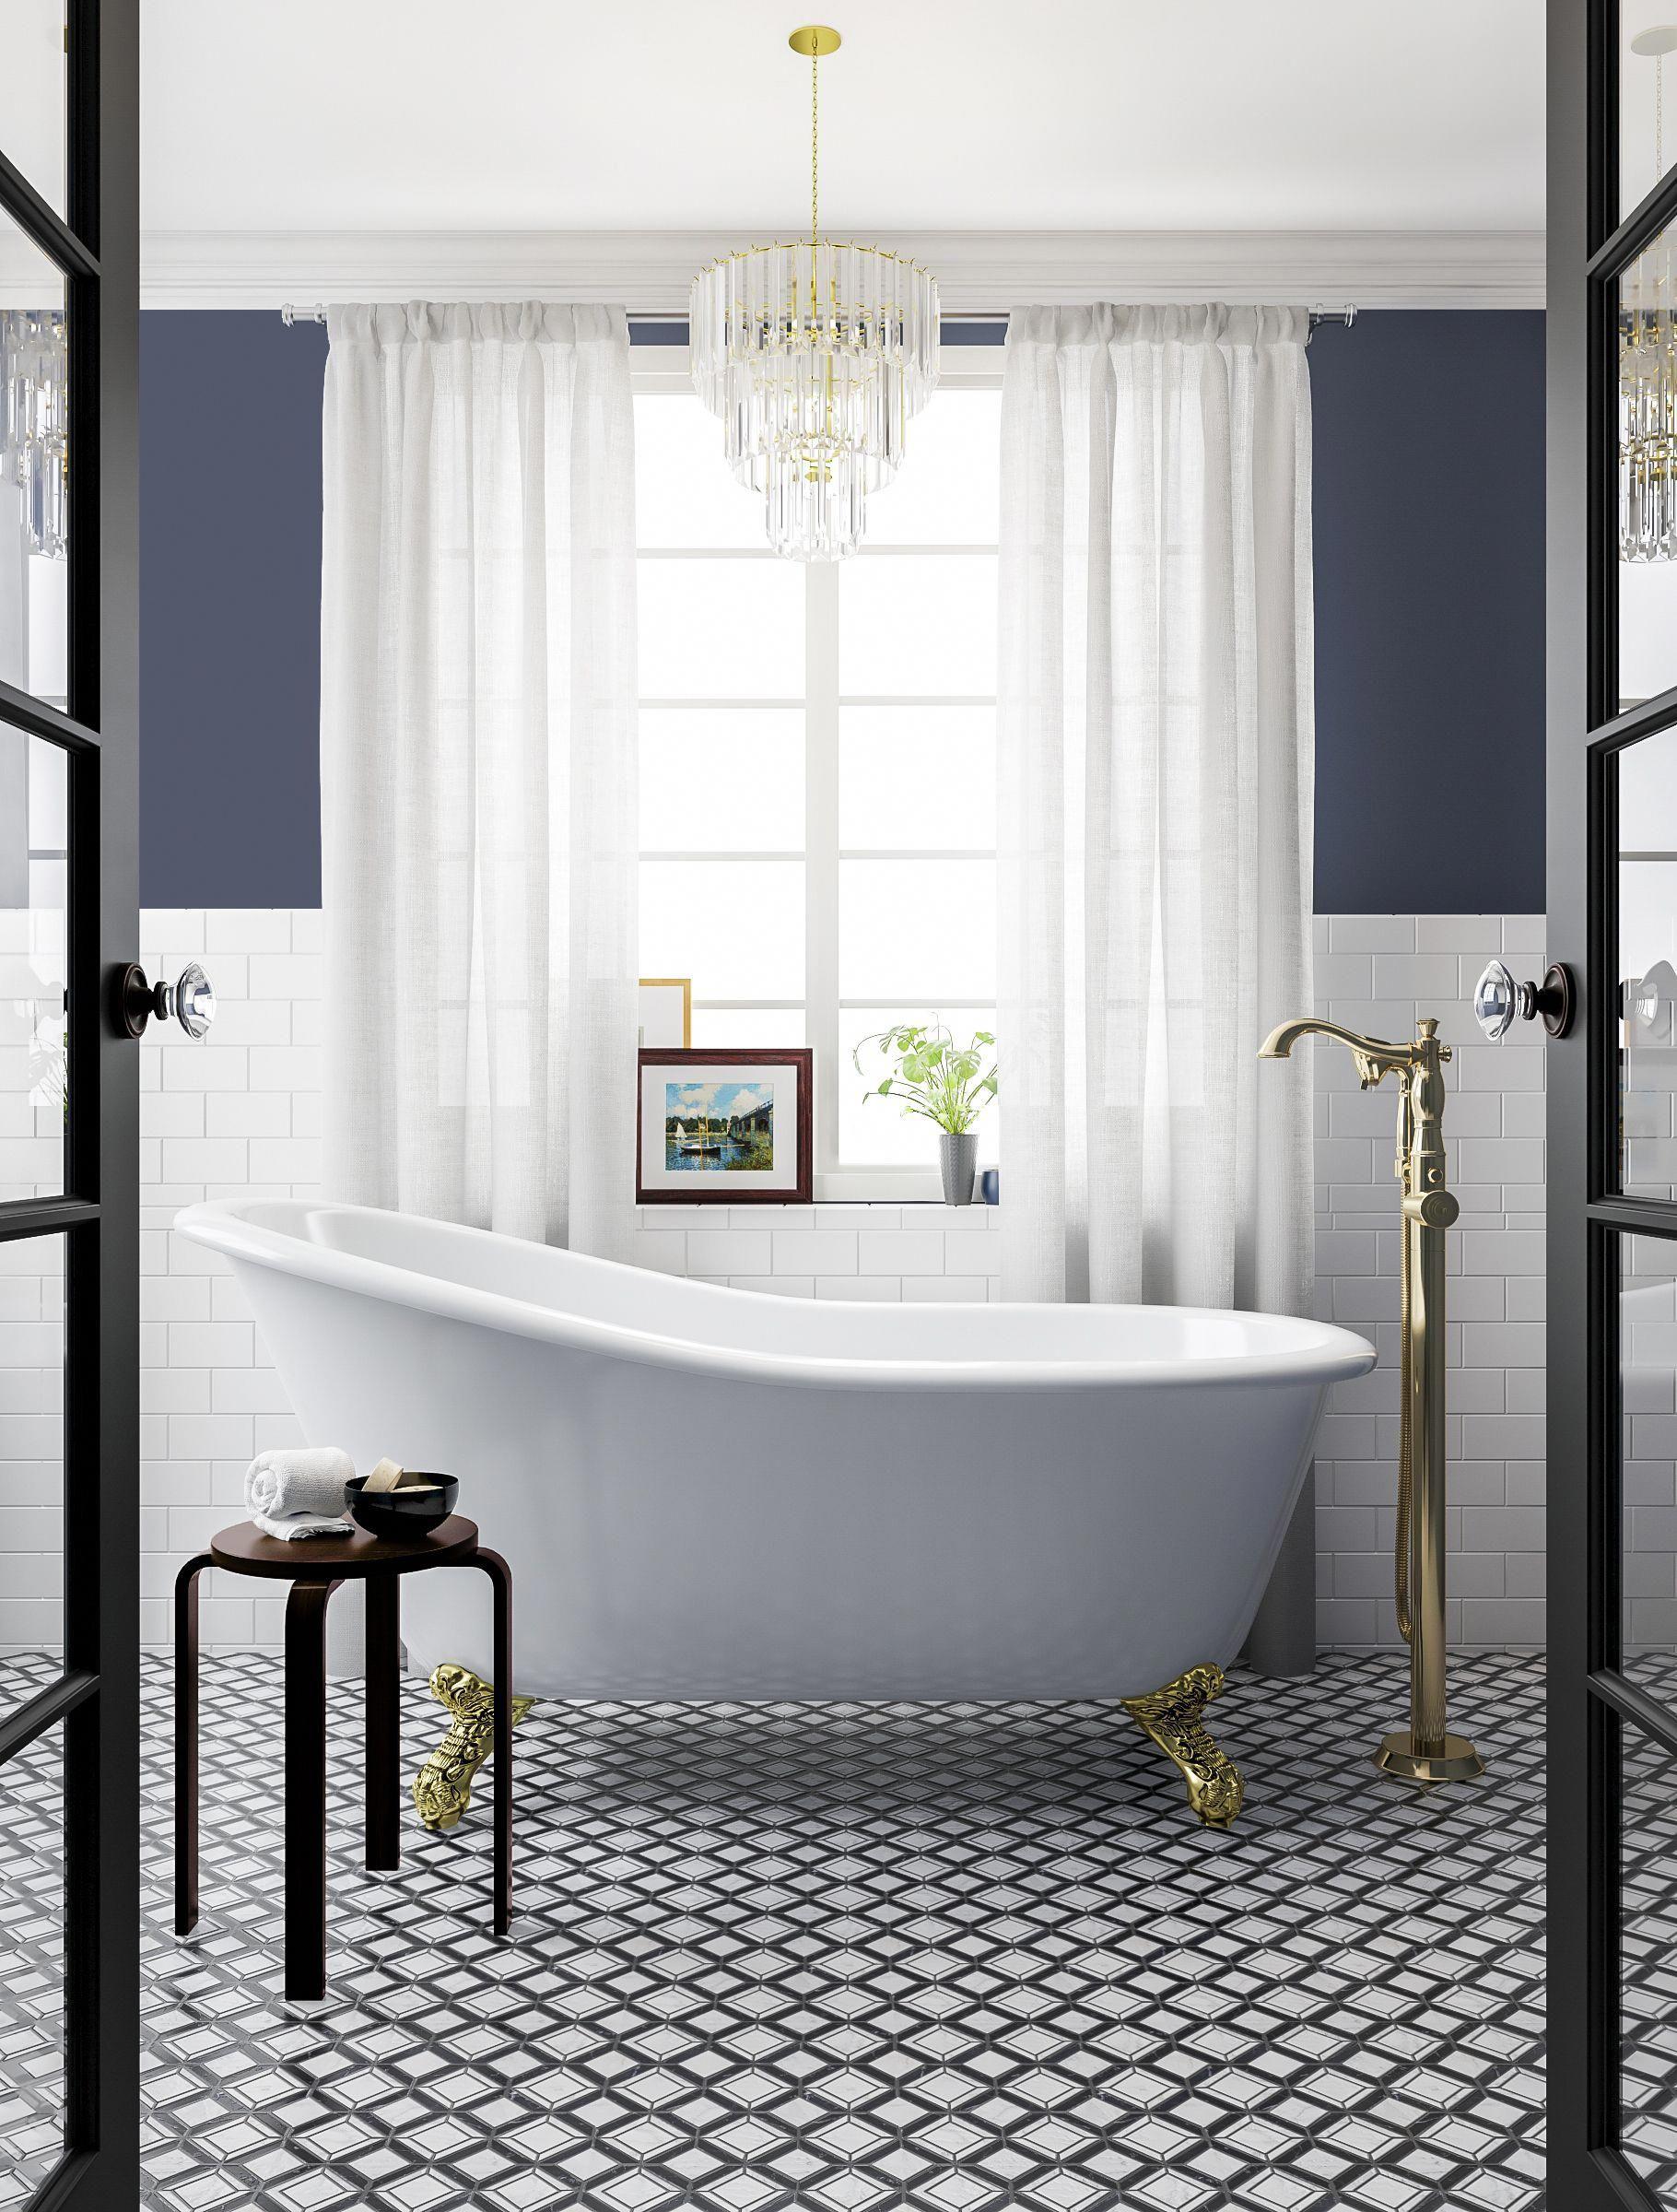 Small Bathroom Decorating Ideas Bathroomshot Bathroomsuite Bathroomideasmaster Remodel Cost Remodeling